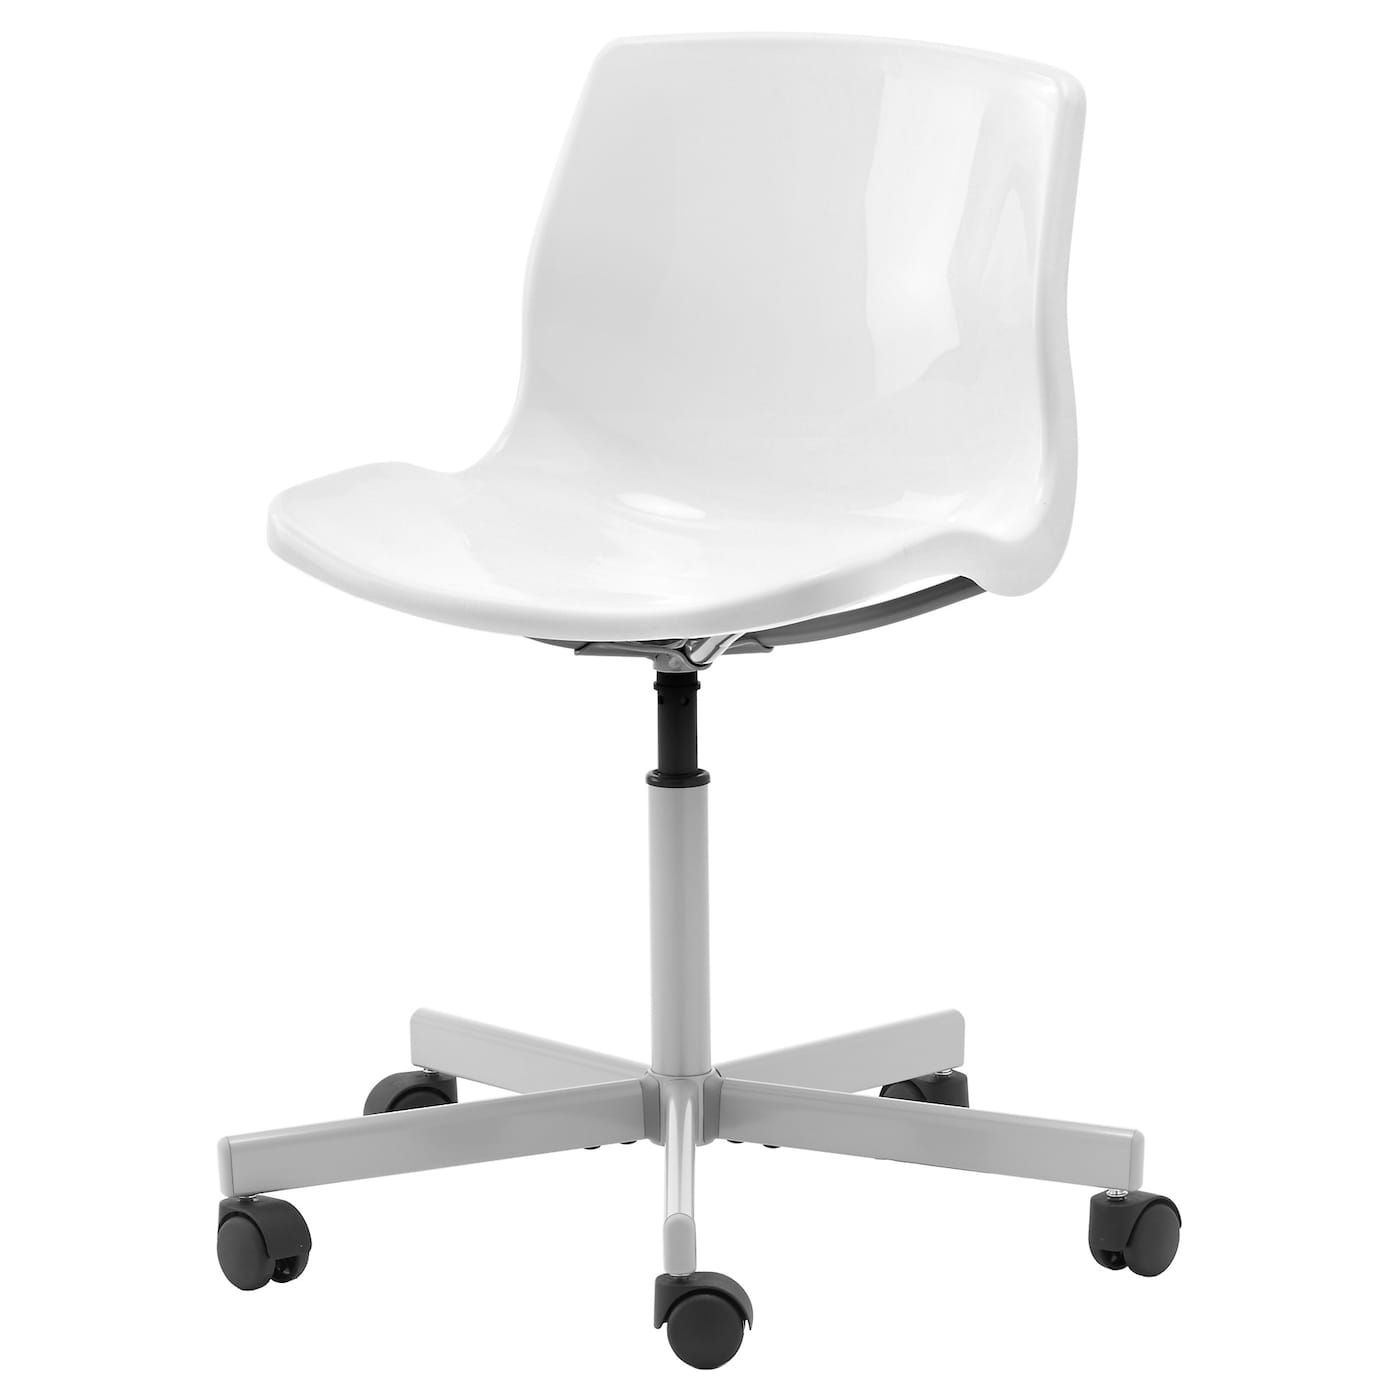 Ikea Us Furniture And Home Furnishings White Desk Chair Ikea Chair Ikea Desk Chair